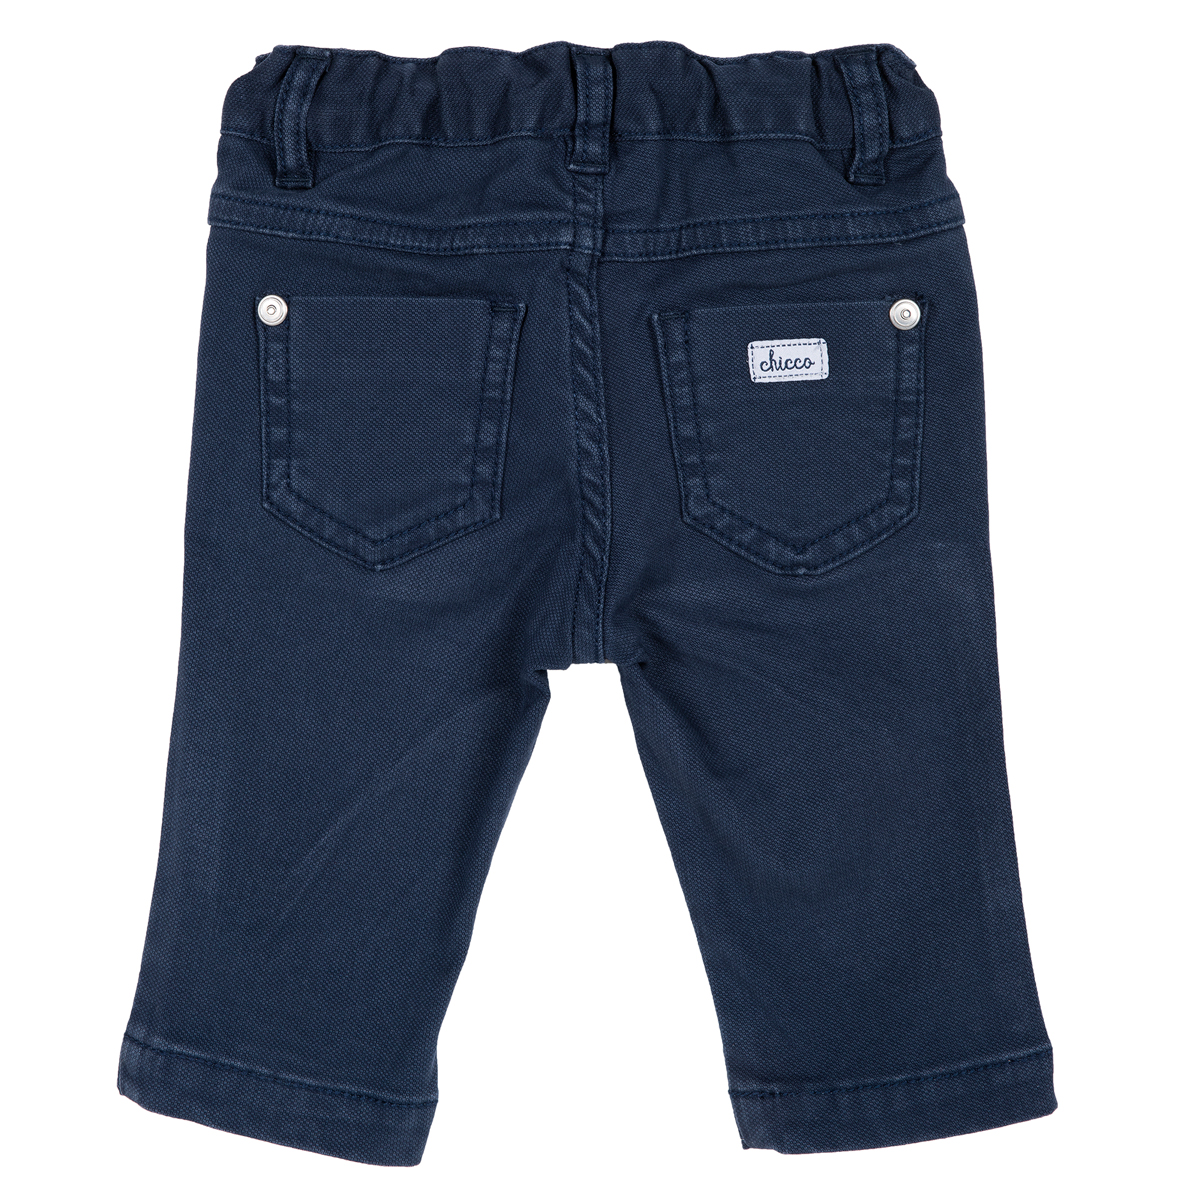 Pantalon lung Chicco, albastru inchis, 24935 din categoria Pantaloni copii